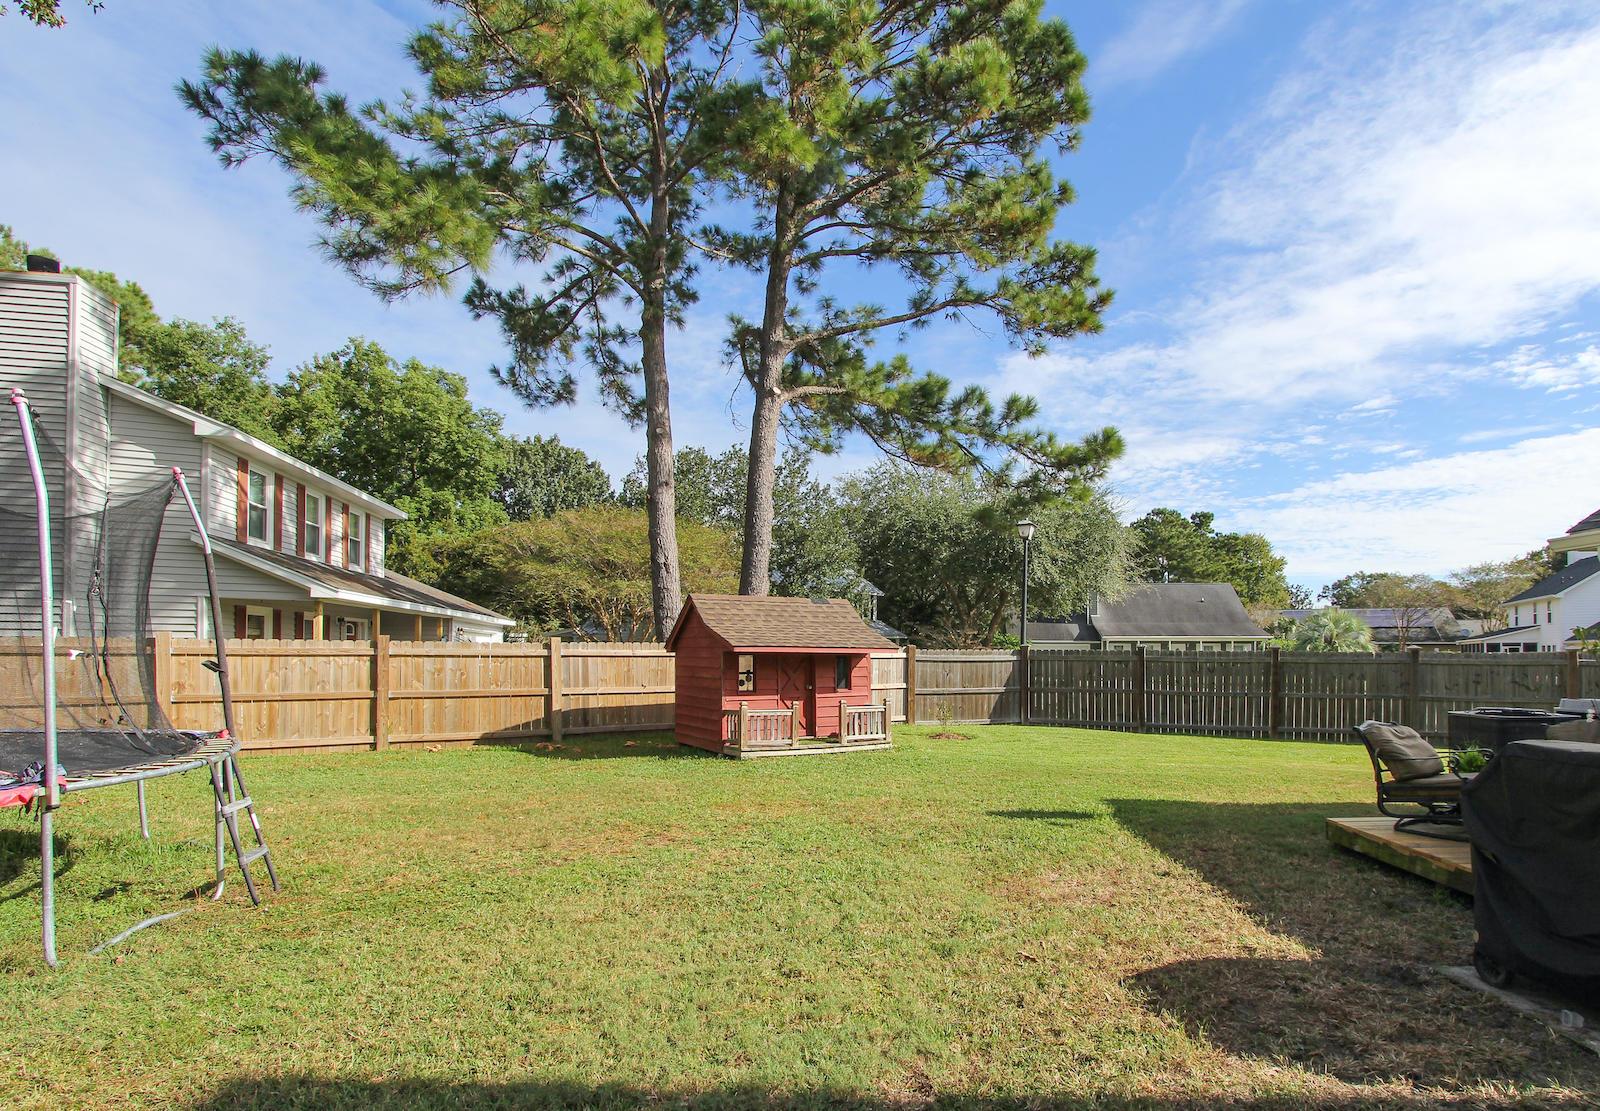 Landings Run Homes For Sale - 1548 Wickfield, Mount Pleasant, SC - 7